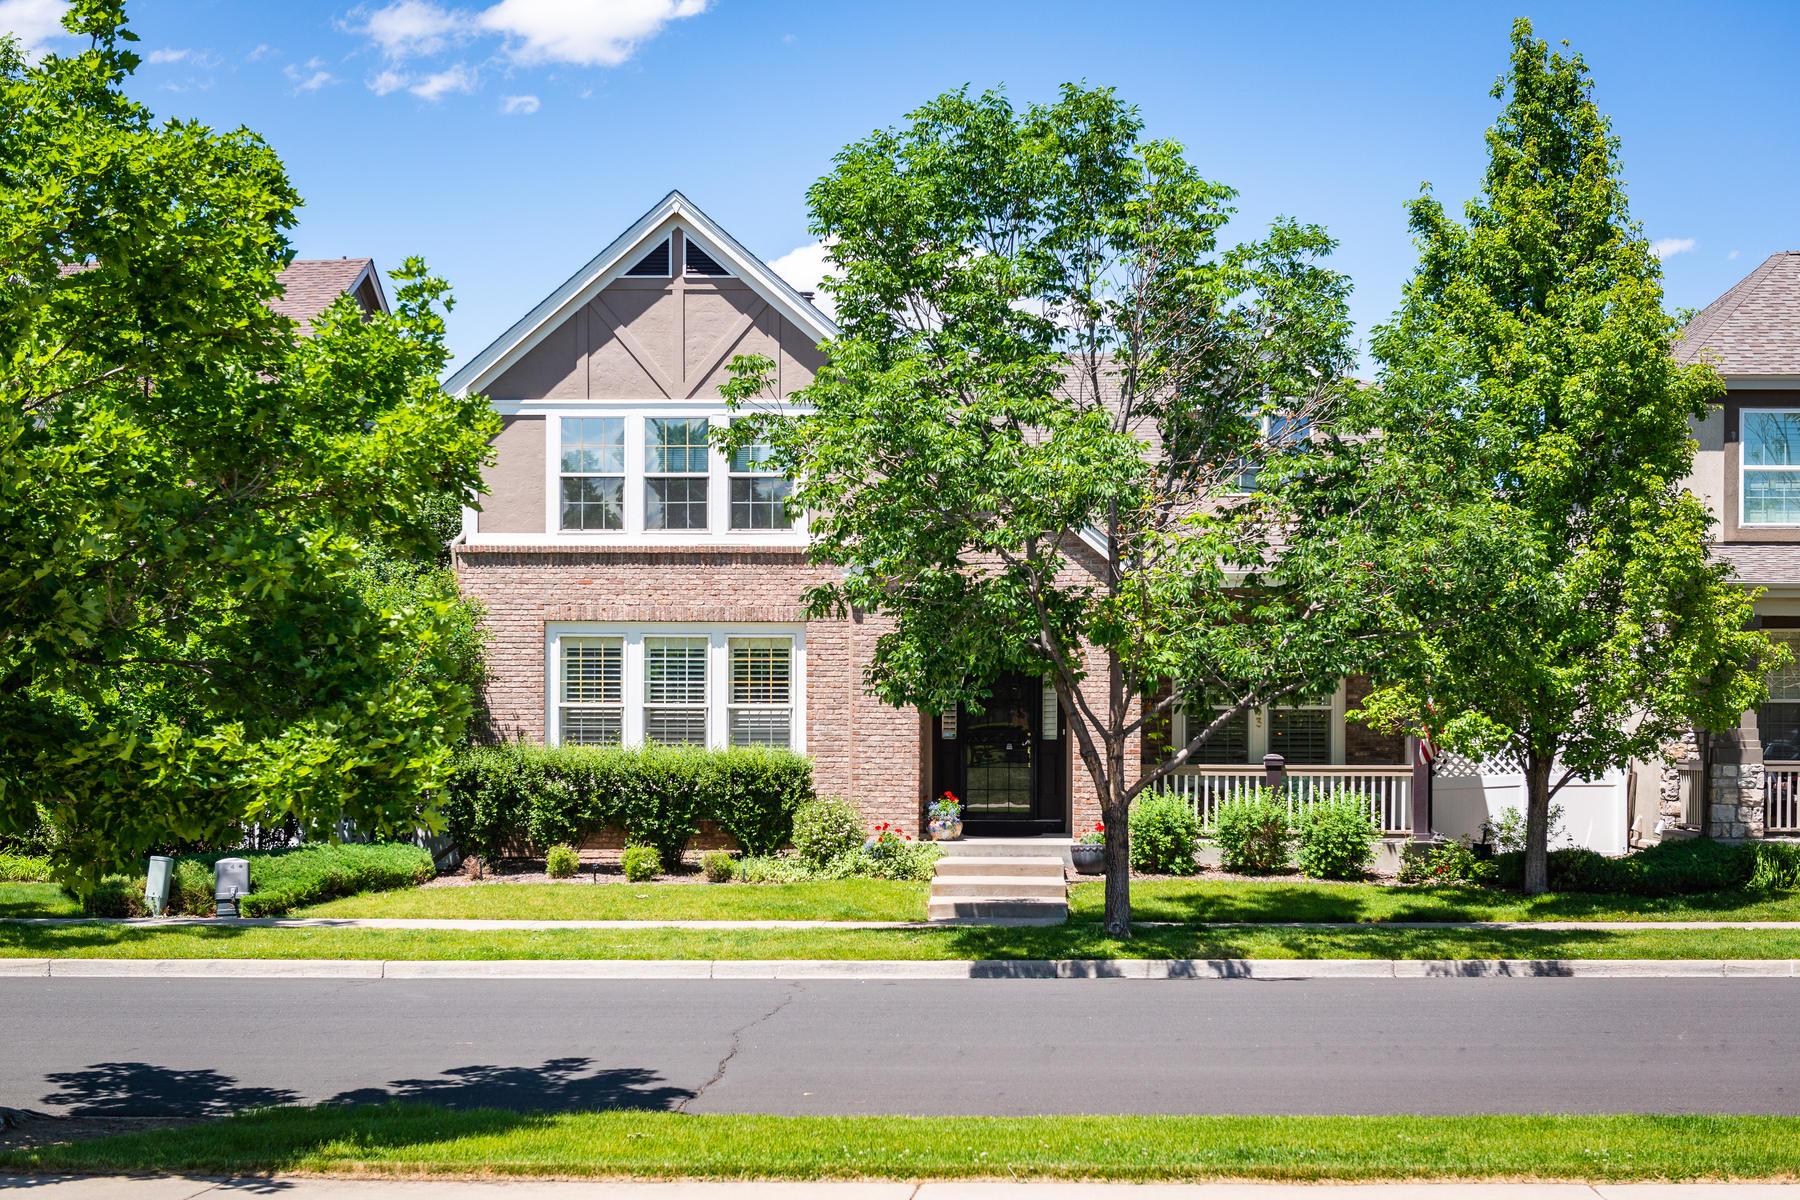 Property для того Продажа на Rare Main Floor Master Retreat facing Bayaud Park 7363 E Bayaud Avenue, Denver, Колорадо 80230 Соединенные Штаты